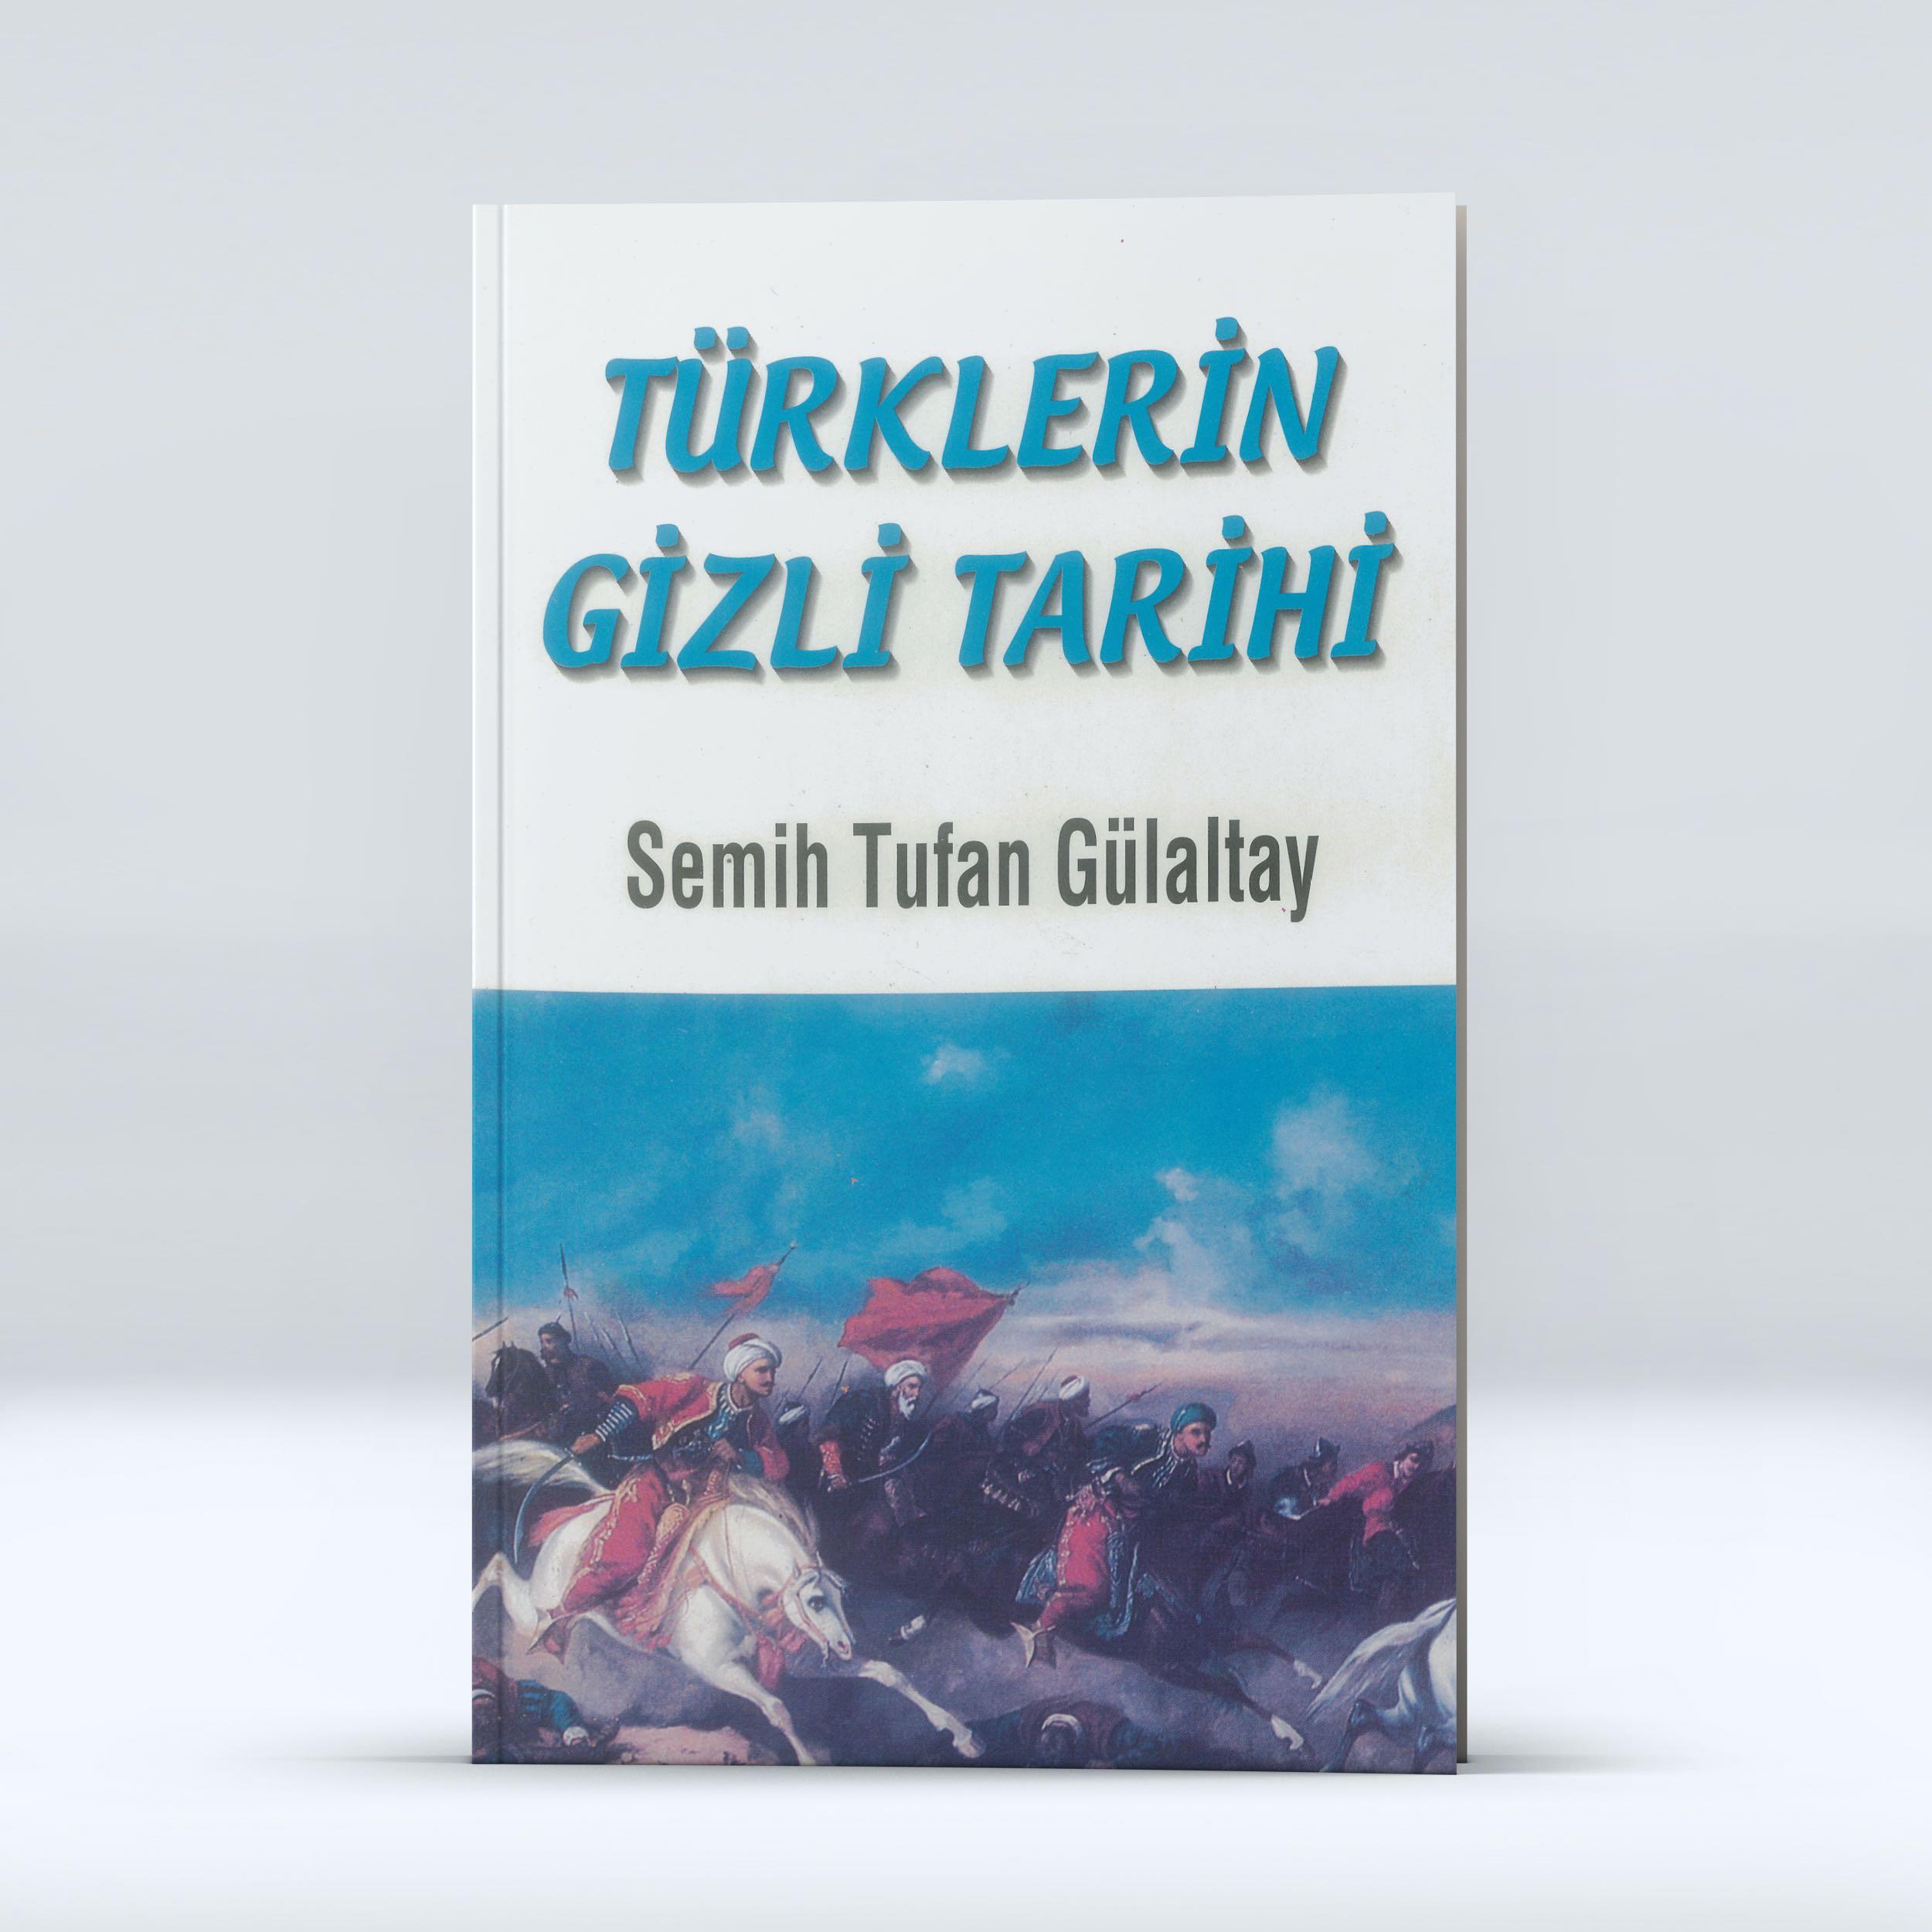 Semih Tufan Gülaltay